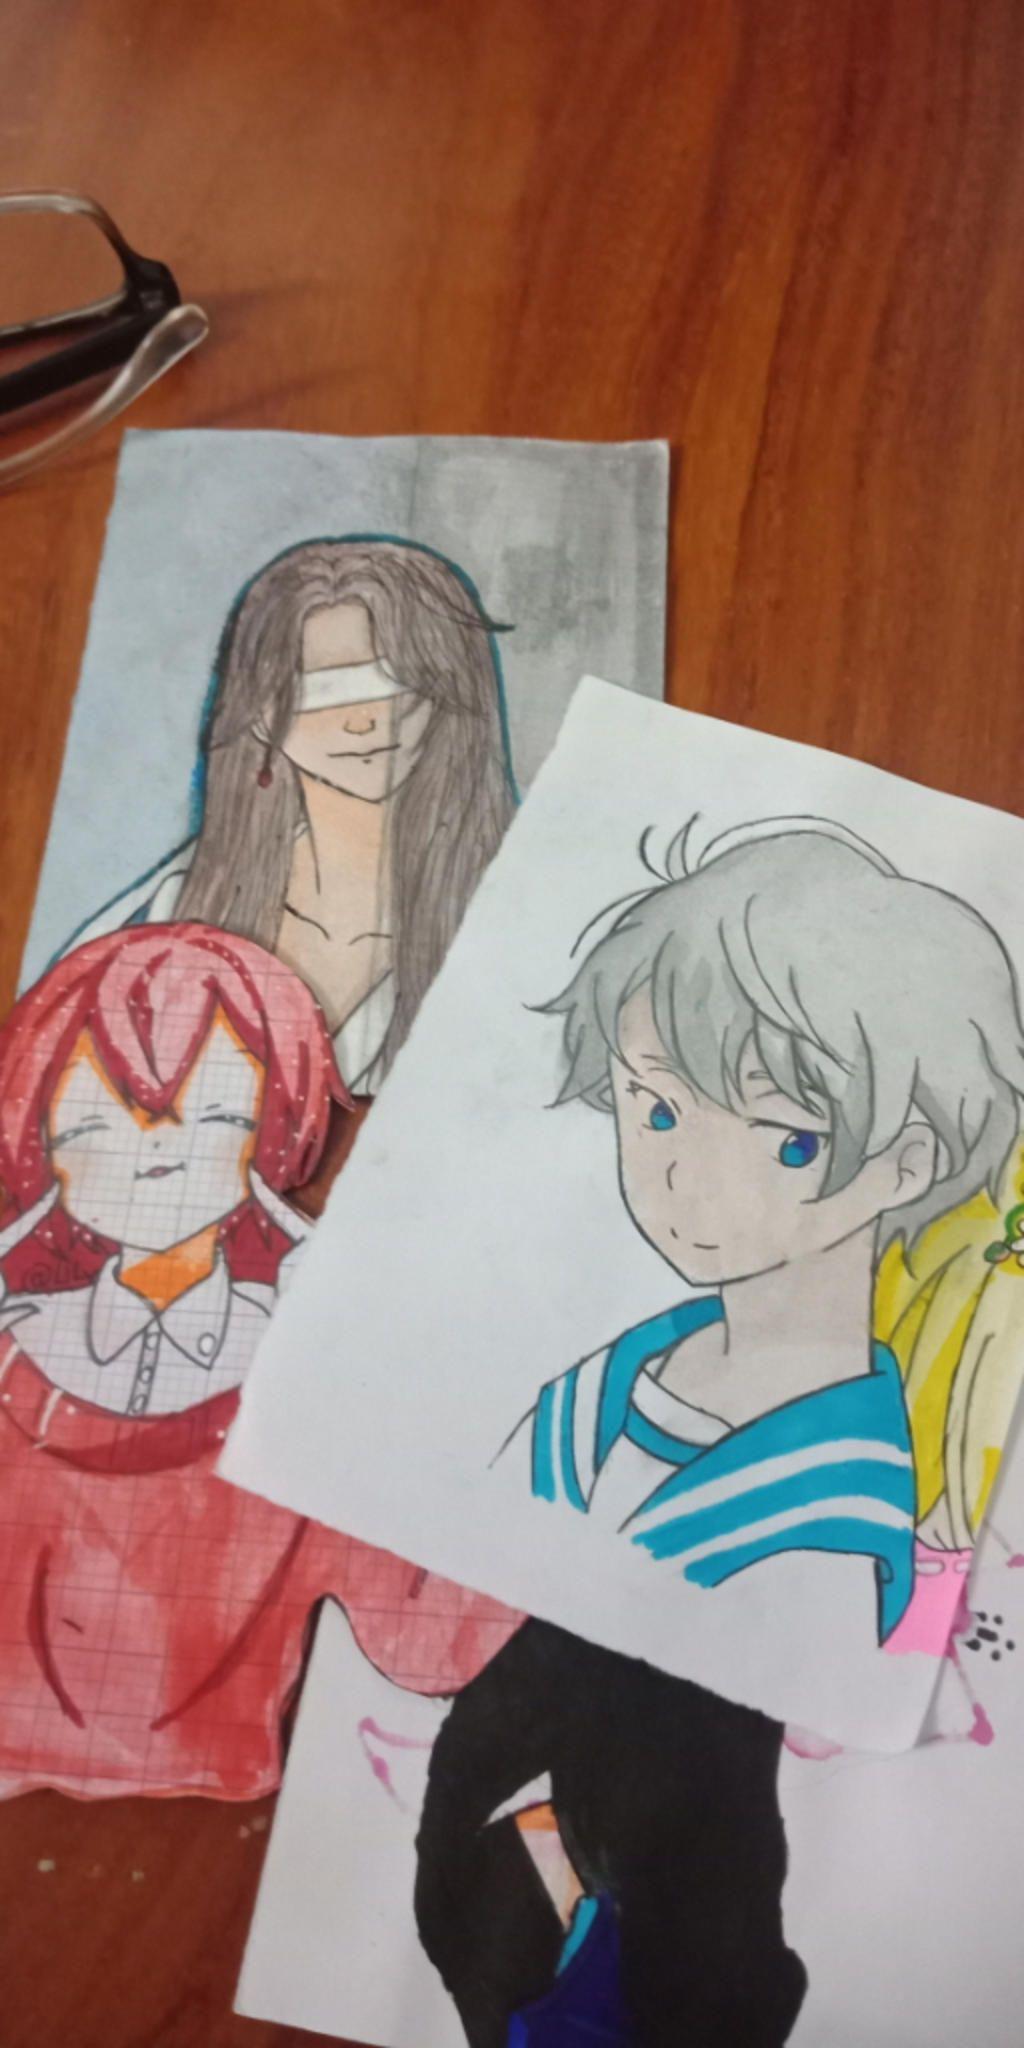 ve-anime-boy-ve-dang-hoang-con-ko-thi-phan-nha-no-app-ki-vao-ko-nhan-tranh-cu-good-luck